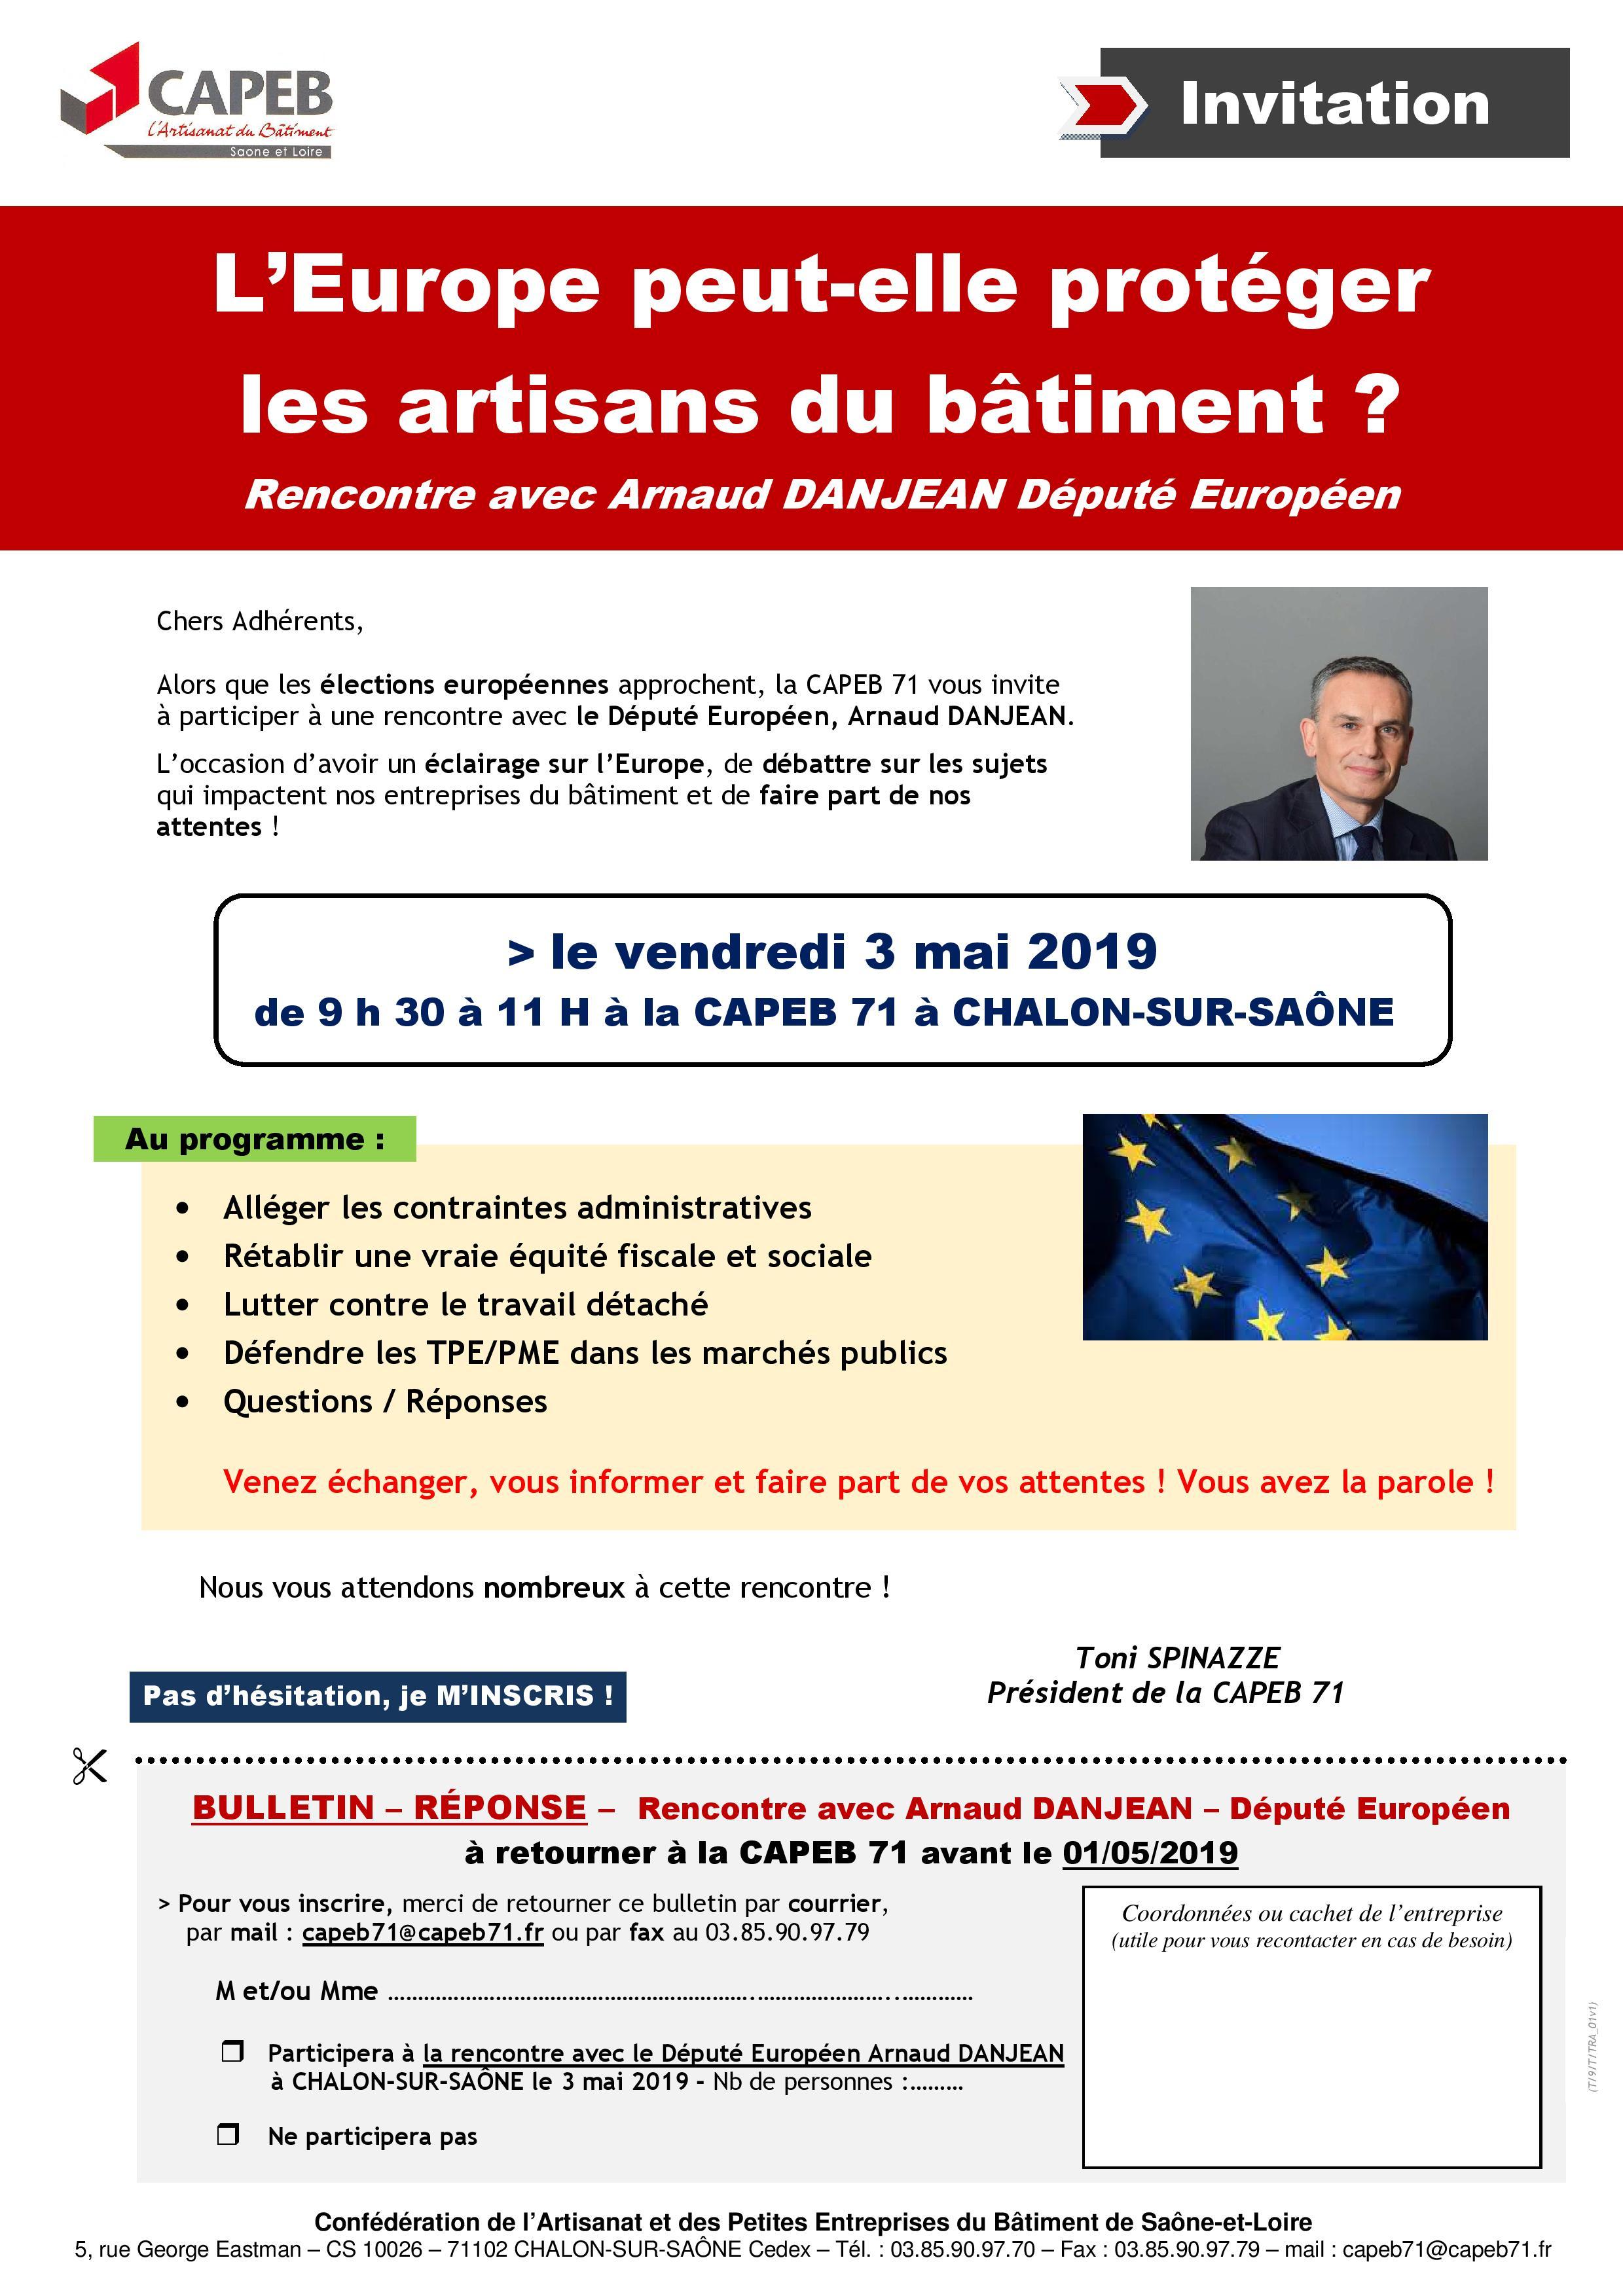 190503_capeb71_Invitation rencontre avec Arnaud DANJEAN